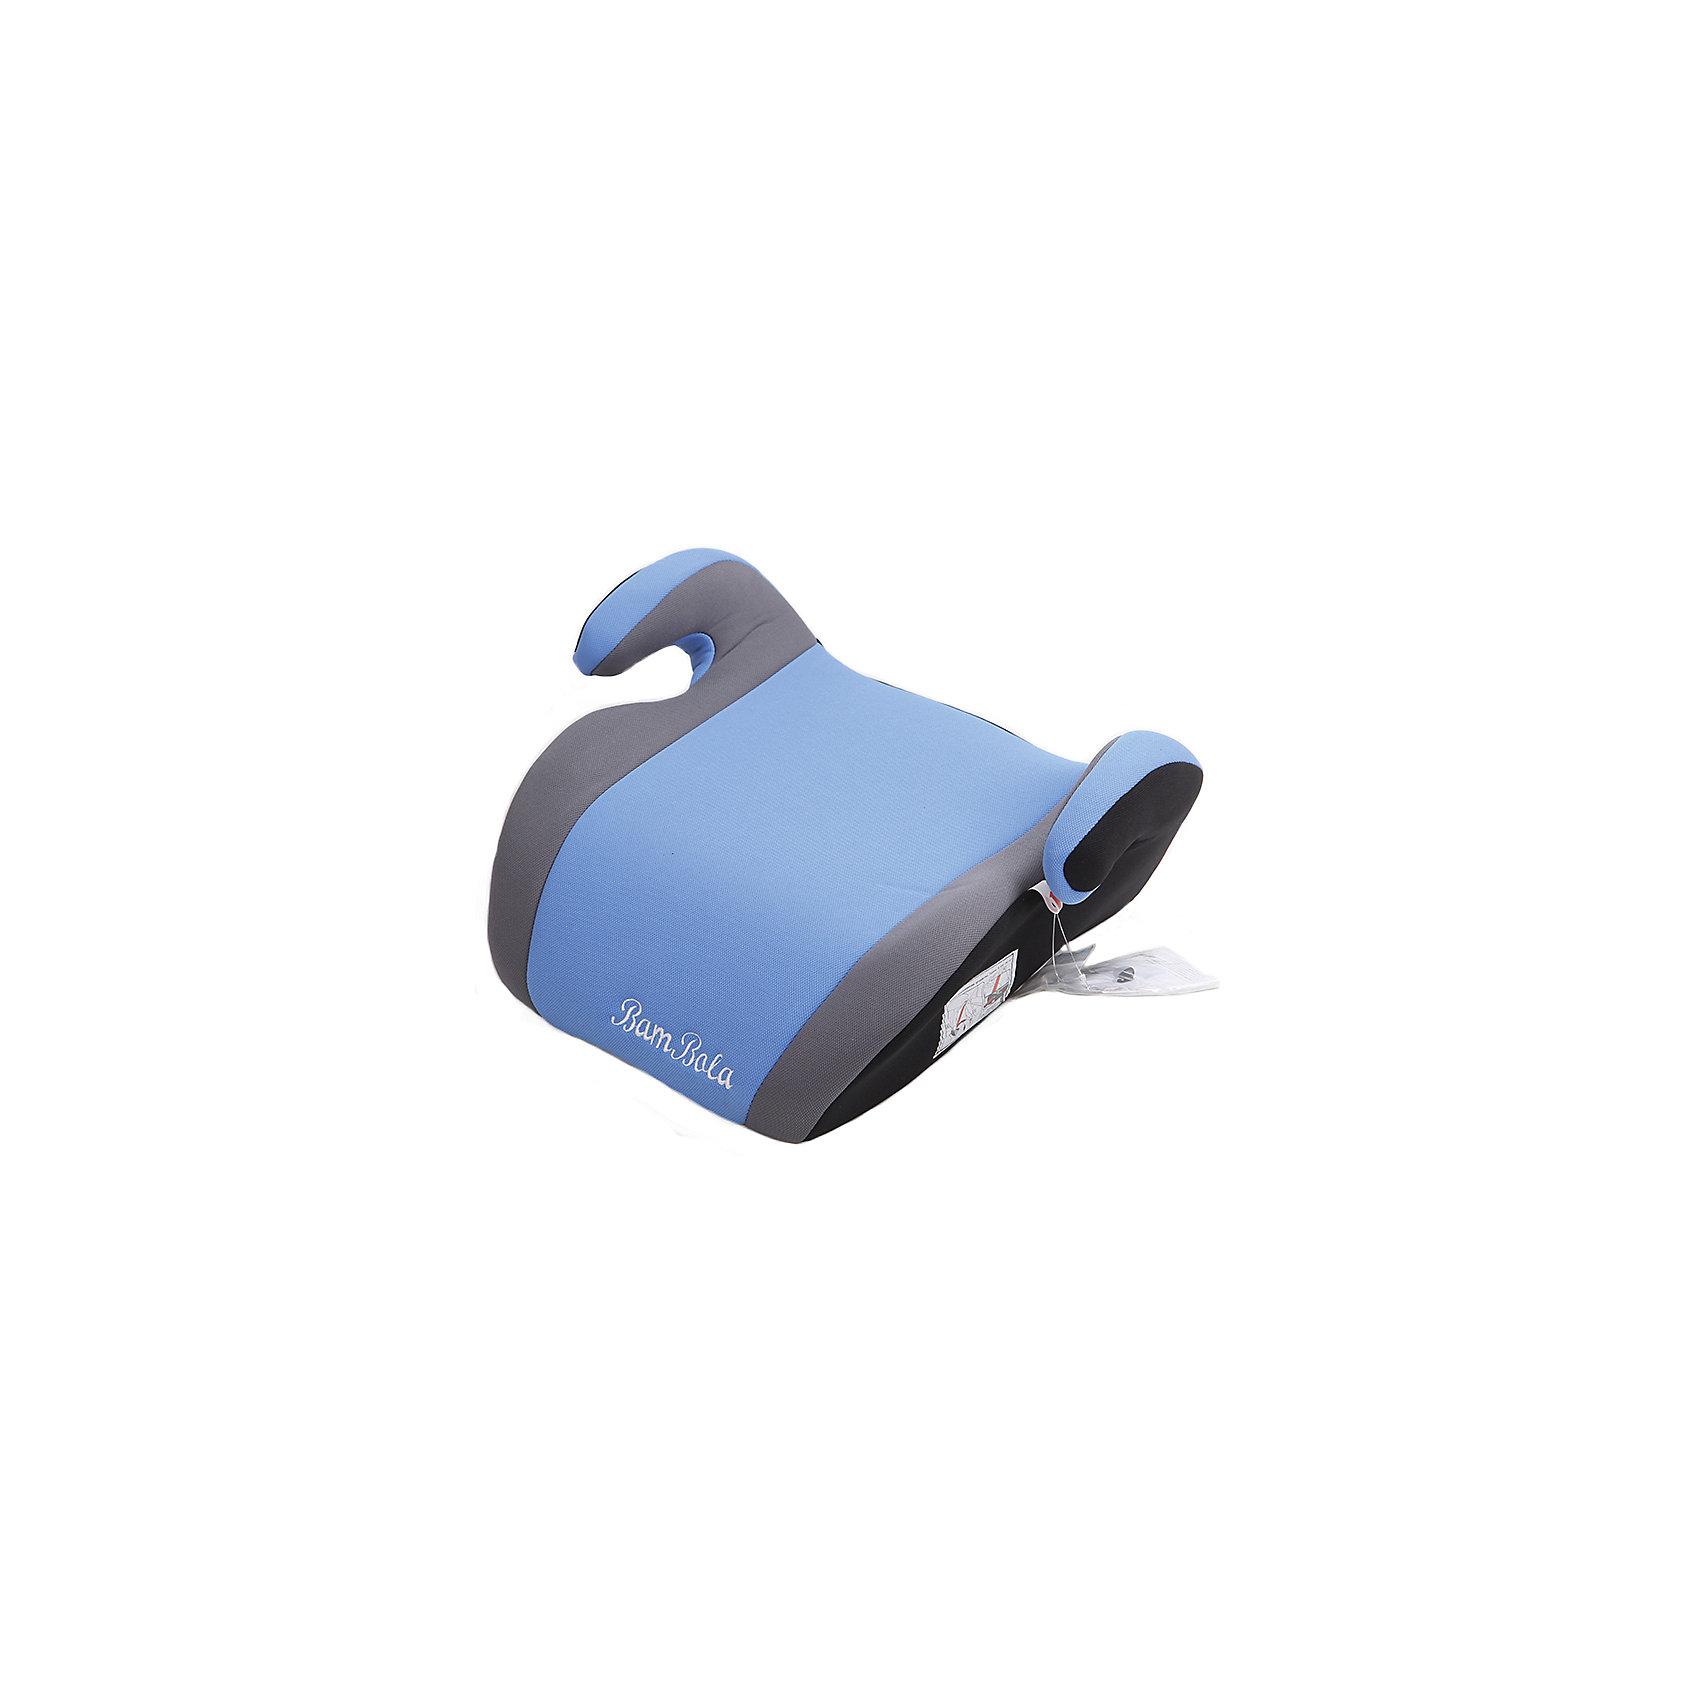 Автокресло-бустер Bambola TUTELA 15-36 кг, серый/голубойГруппа 2-3 (От 15 до 36 кг)<br>BAMBOLA Бустер 15-36 кг TUTELA Серый/Голубой 6шт/кор<br><br>Ширина мм: 370<br>Глубина мм: 350<br>Высота мм: 190<br>Вес г: 1300<br>Возраст от месяцев: -2147483648<br>Возраст до месяцев: 2147483647<br>Пол: Унисекс<br>Возраст: Детский<br>SKU: 5500141